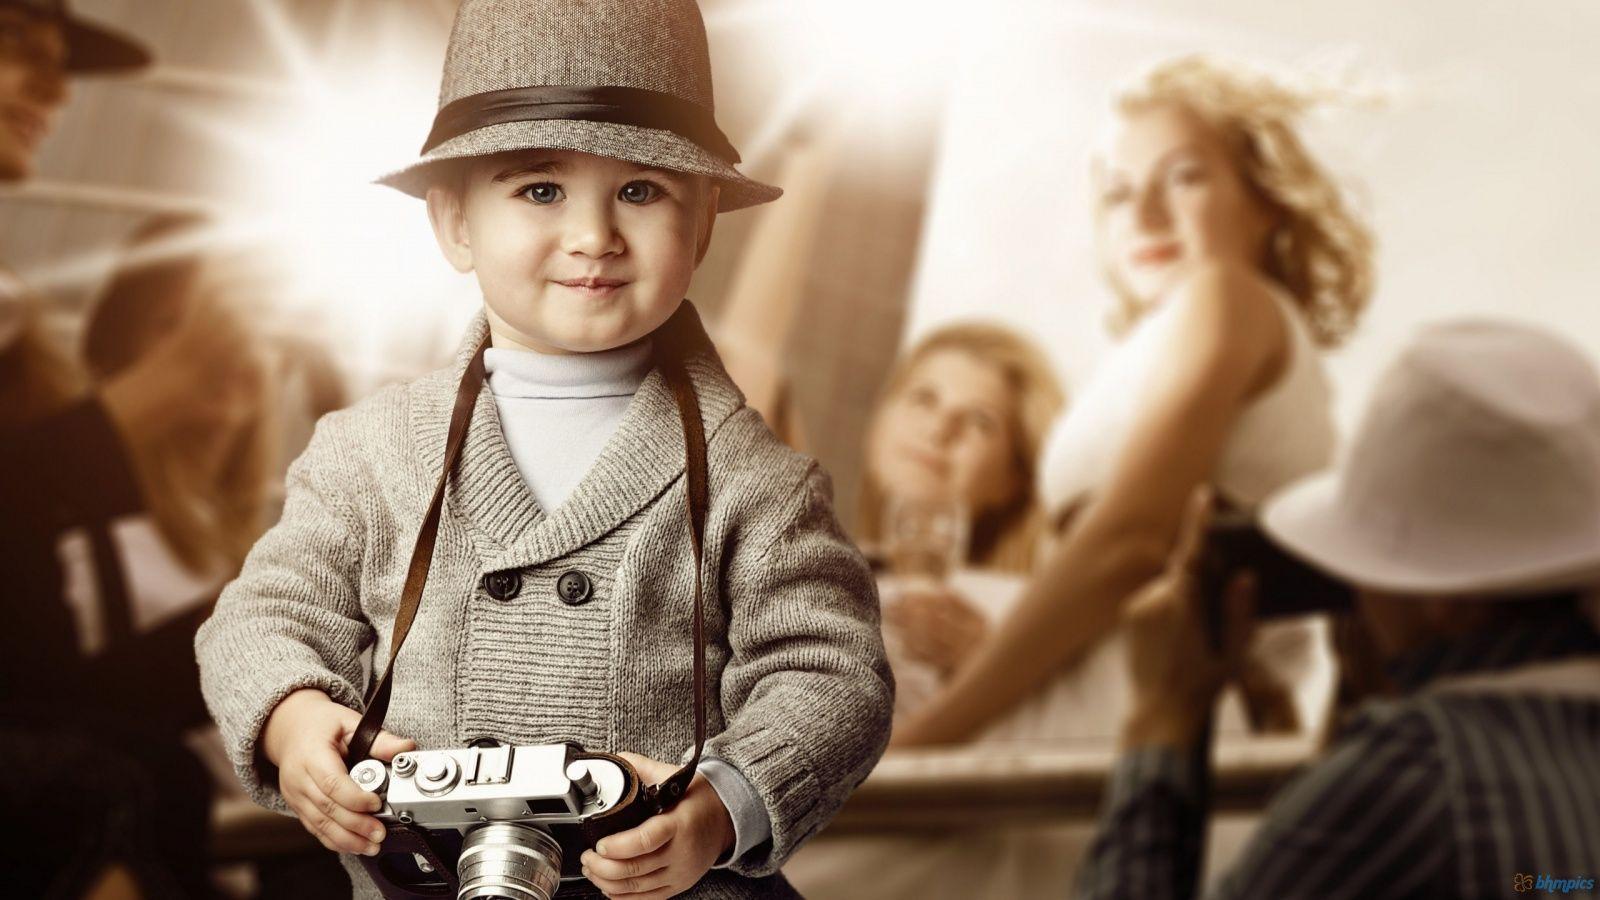 Best Wallpaper Attitude Little Boy - wp2254110  Picture_908062.jpg